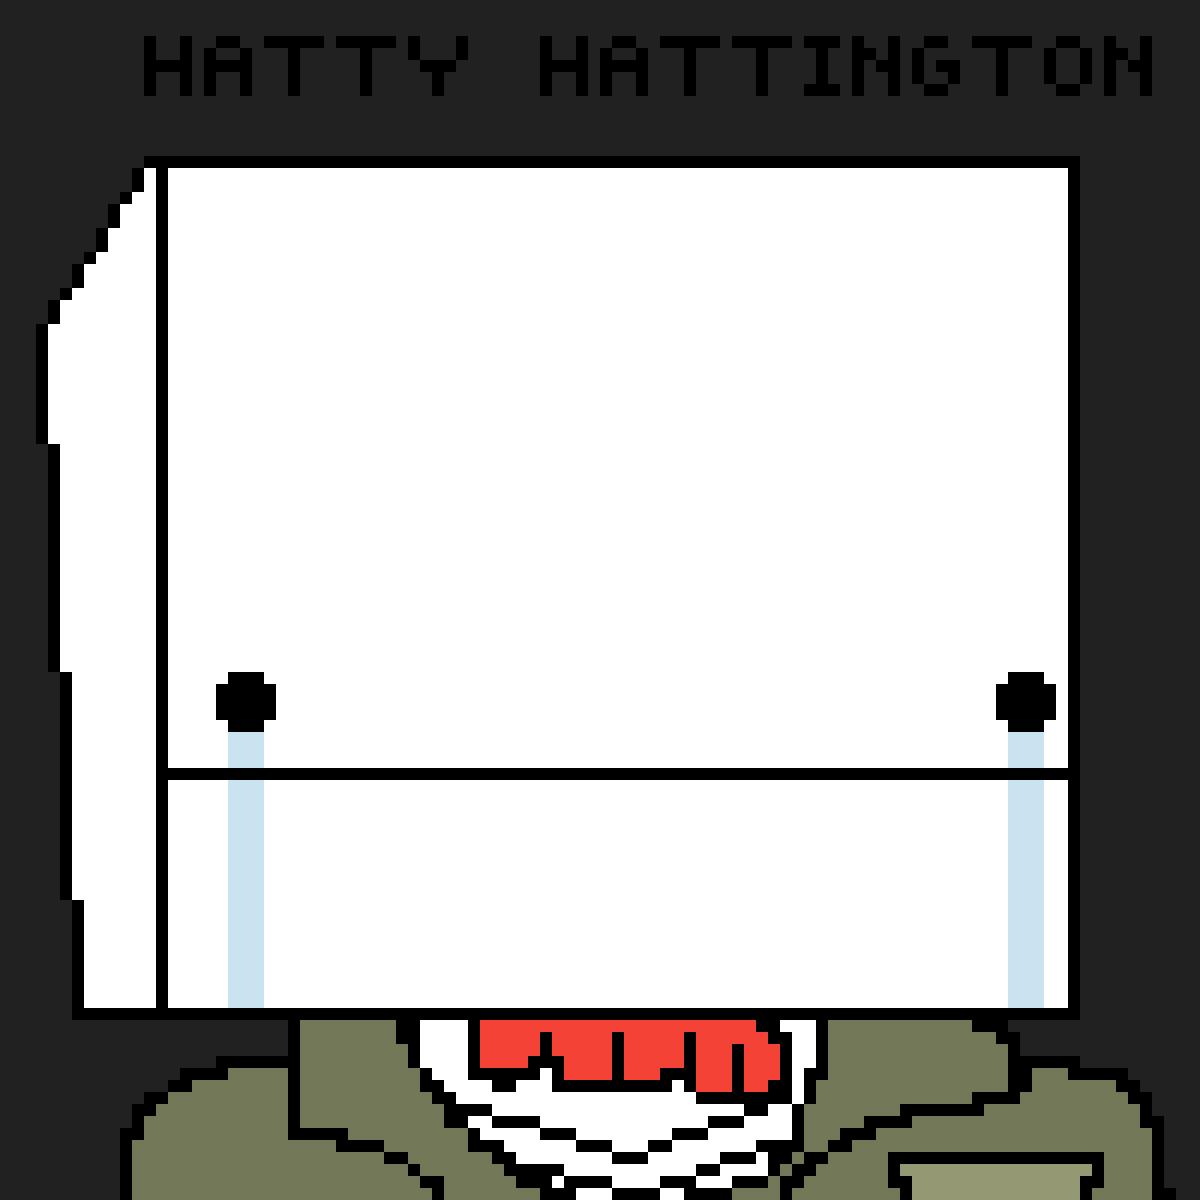 Hatty Hattington - BattleBlock Theater by HeroLeHedgehog